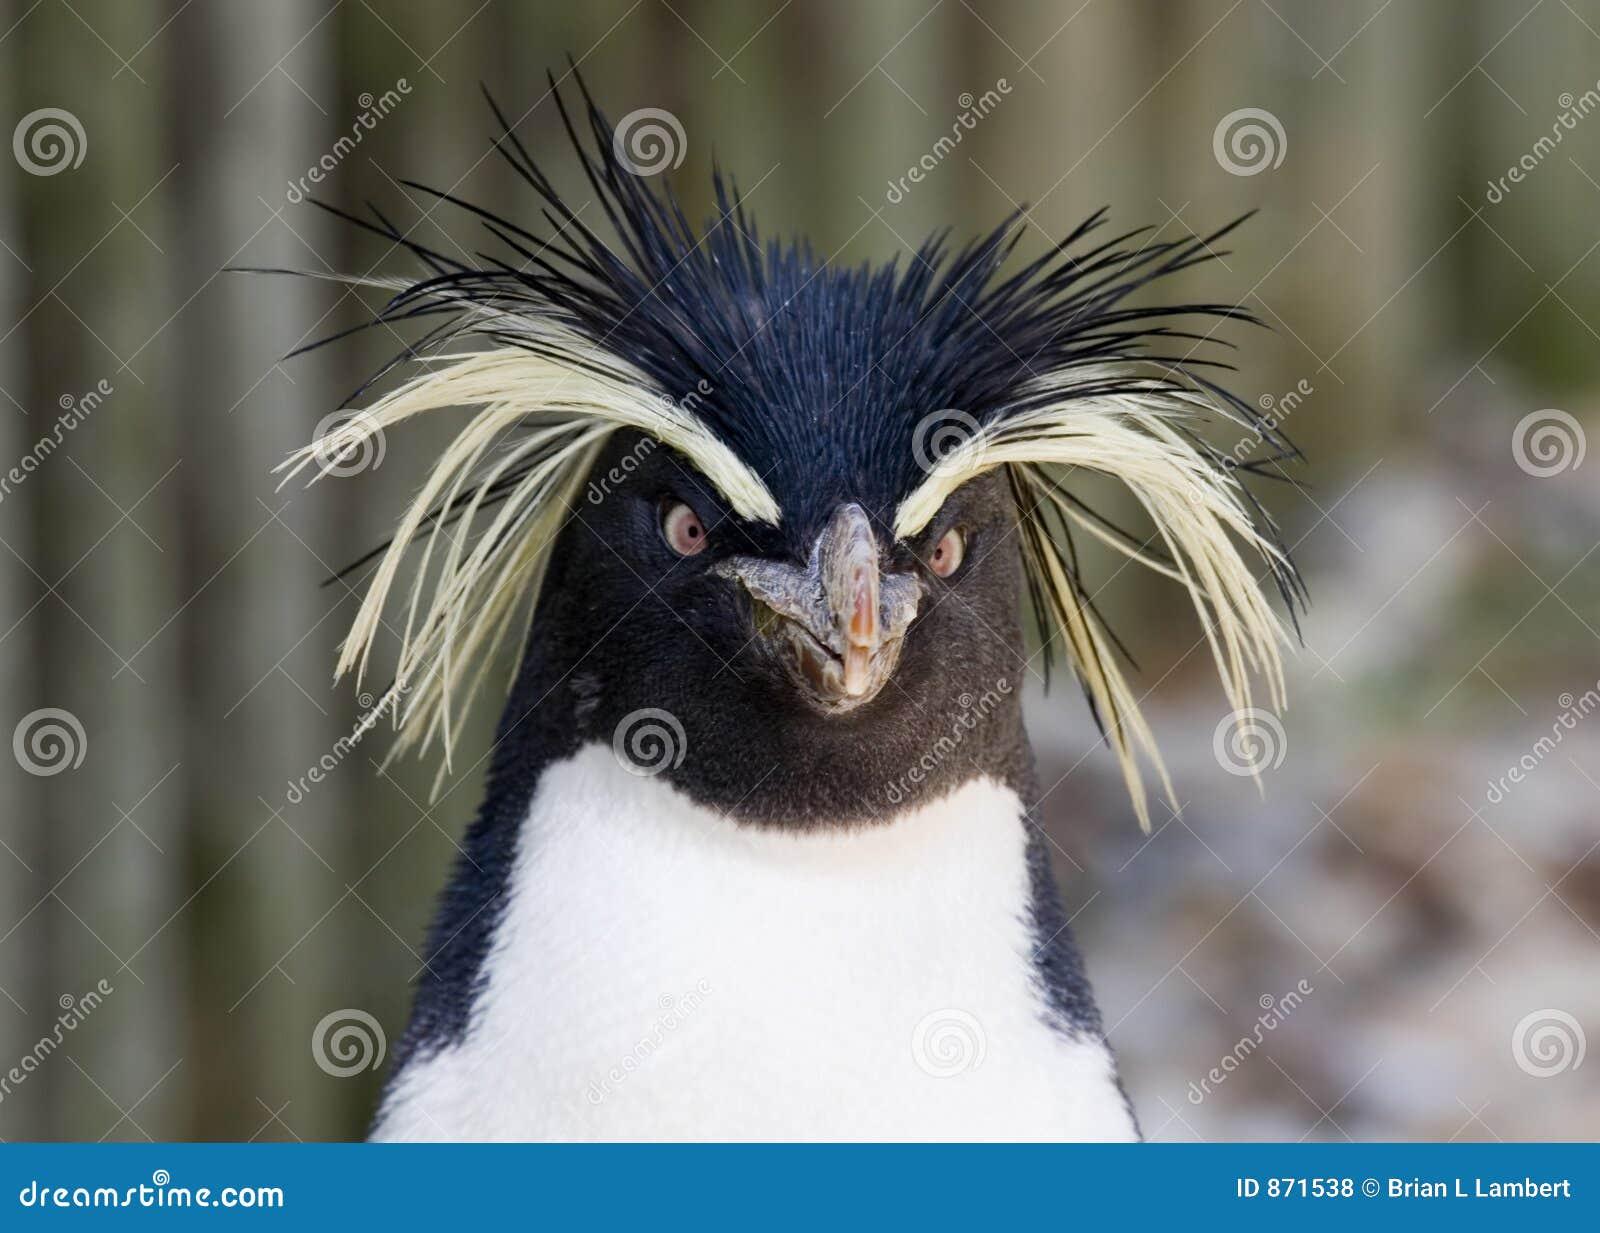 Rockhopper Penguin Royalty Free Stock Photos - Image: 871538